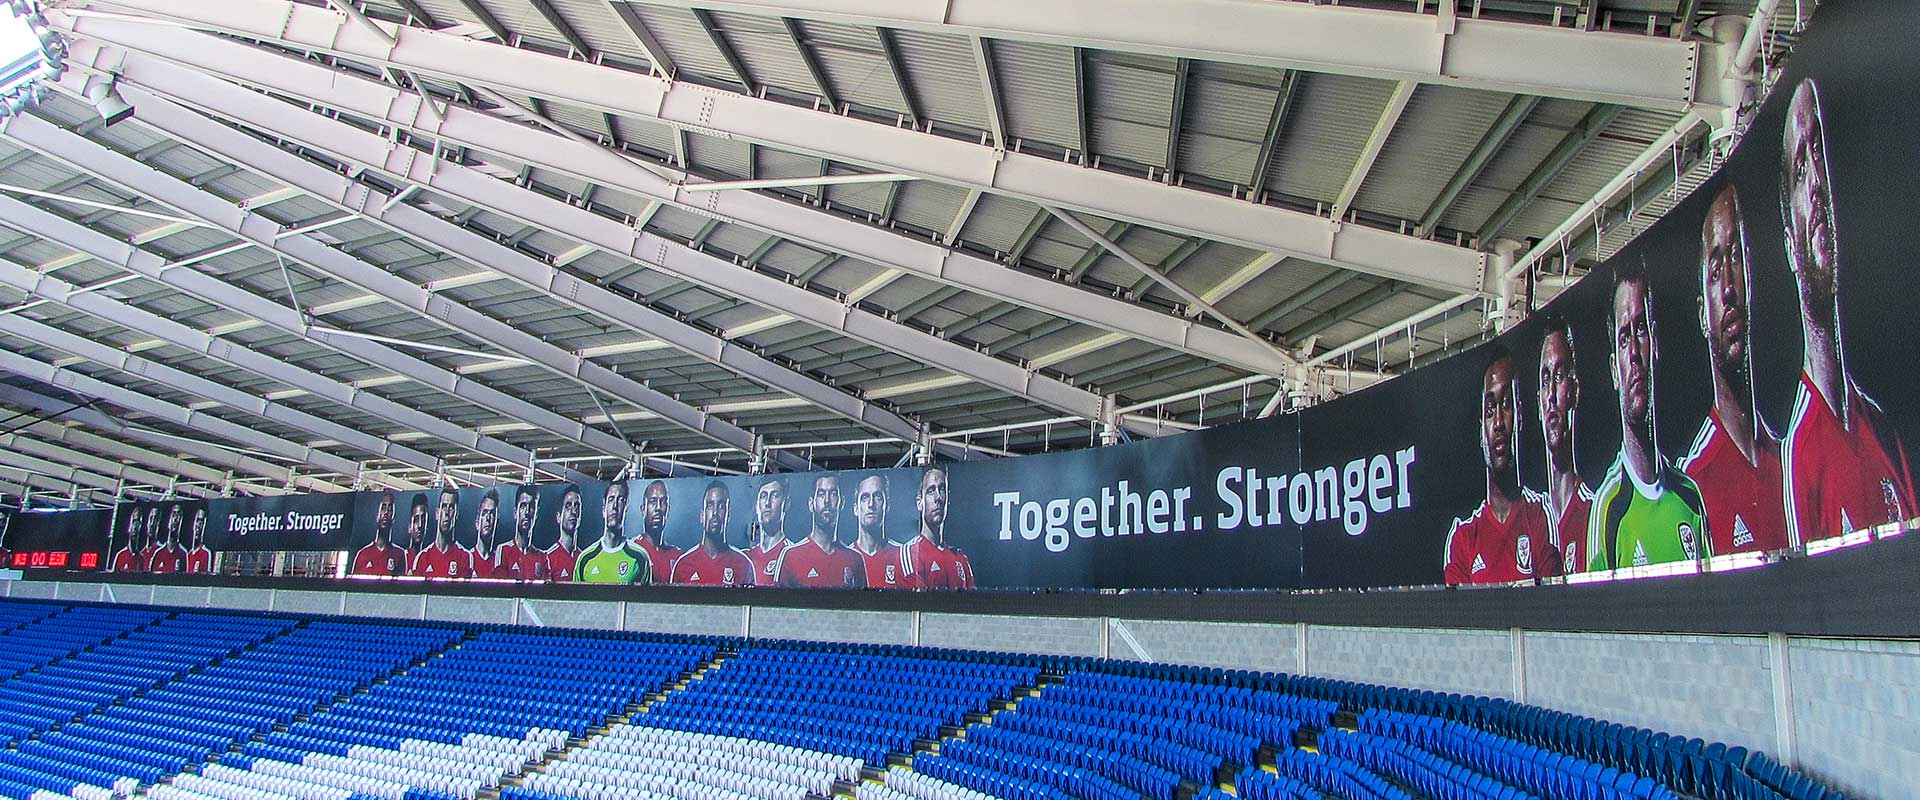 Football Association Wales stadium banners